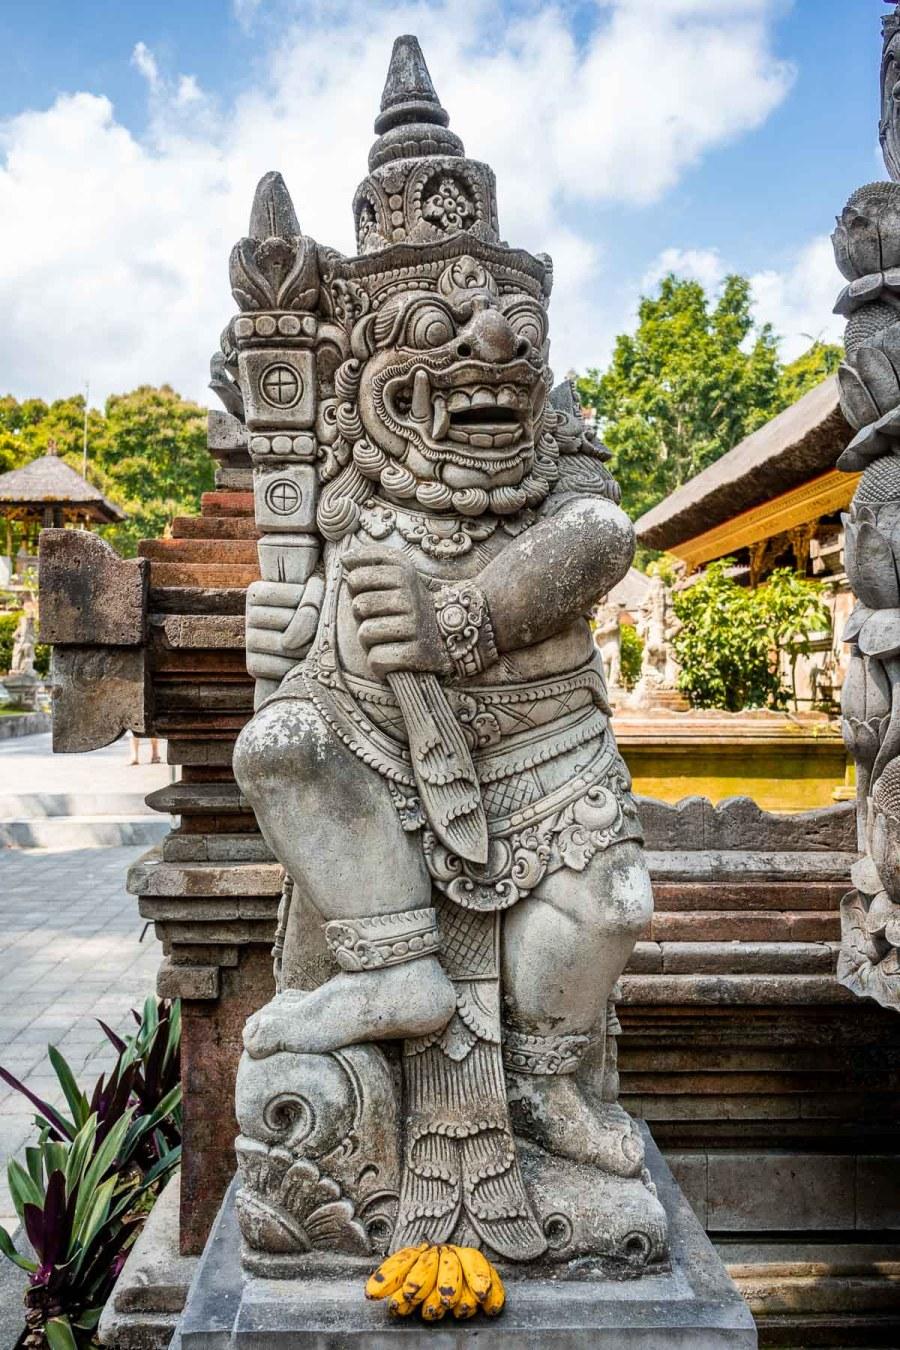 Stone statue at Pura Tirta Empul Temple in Bali